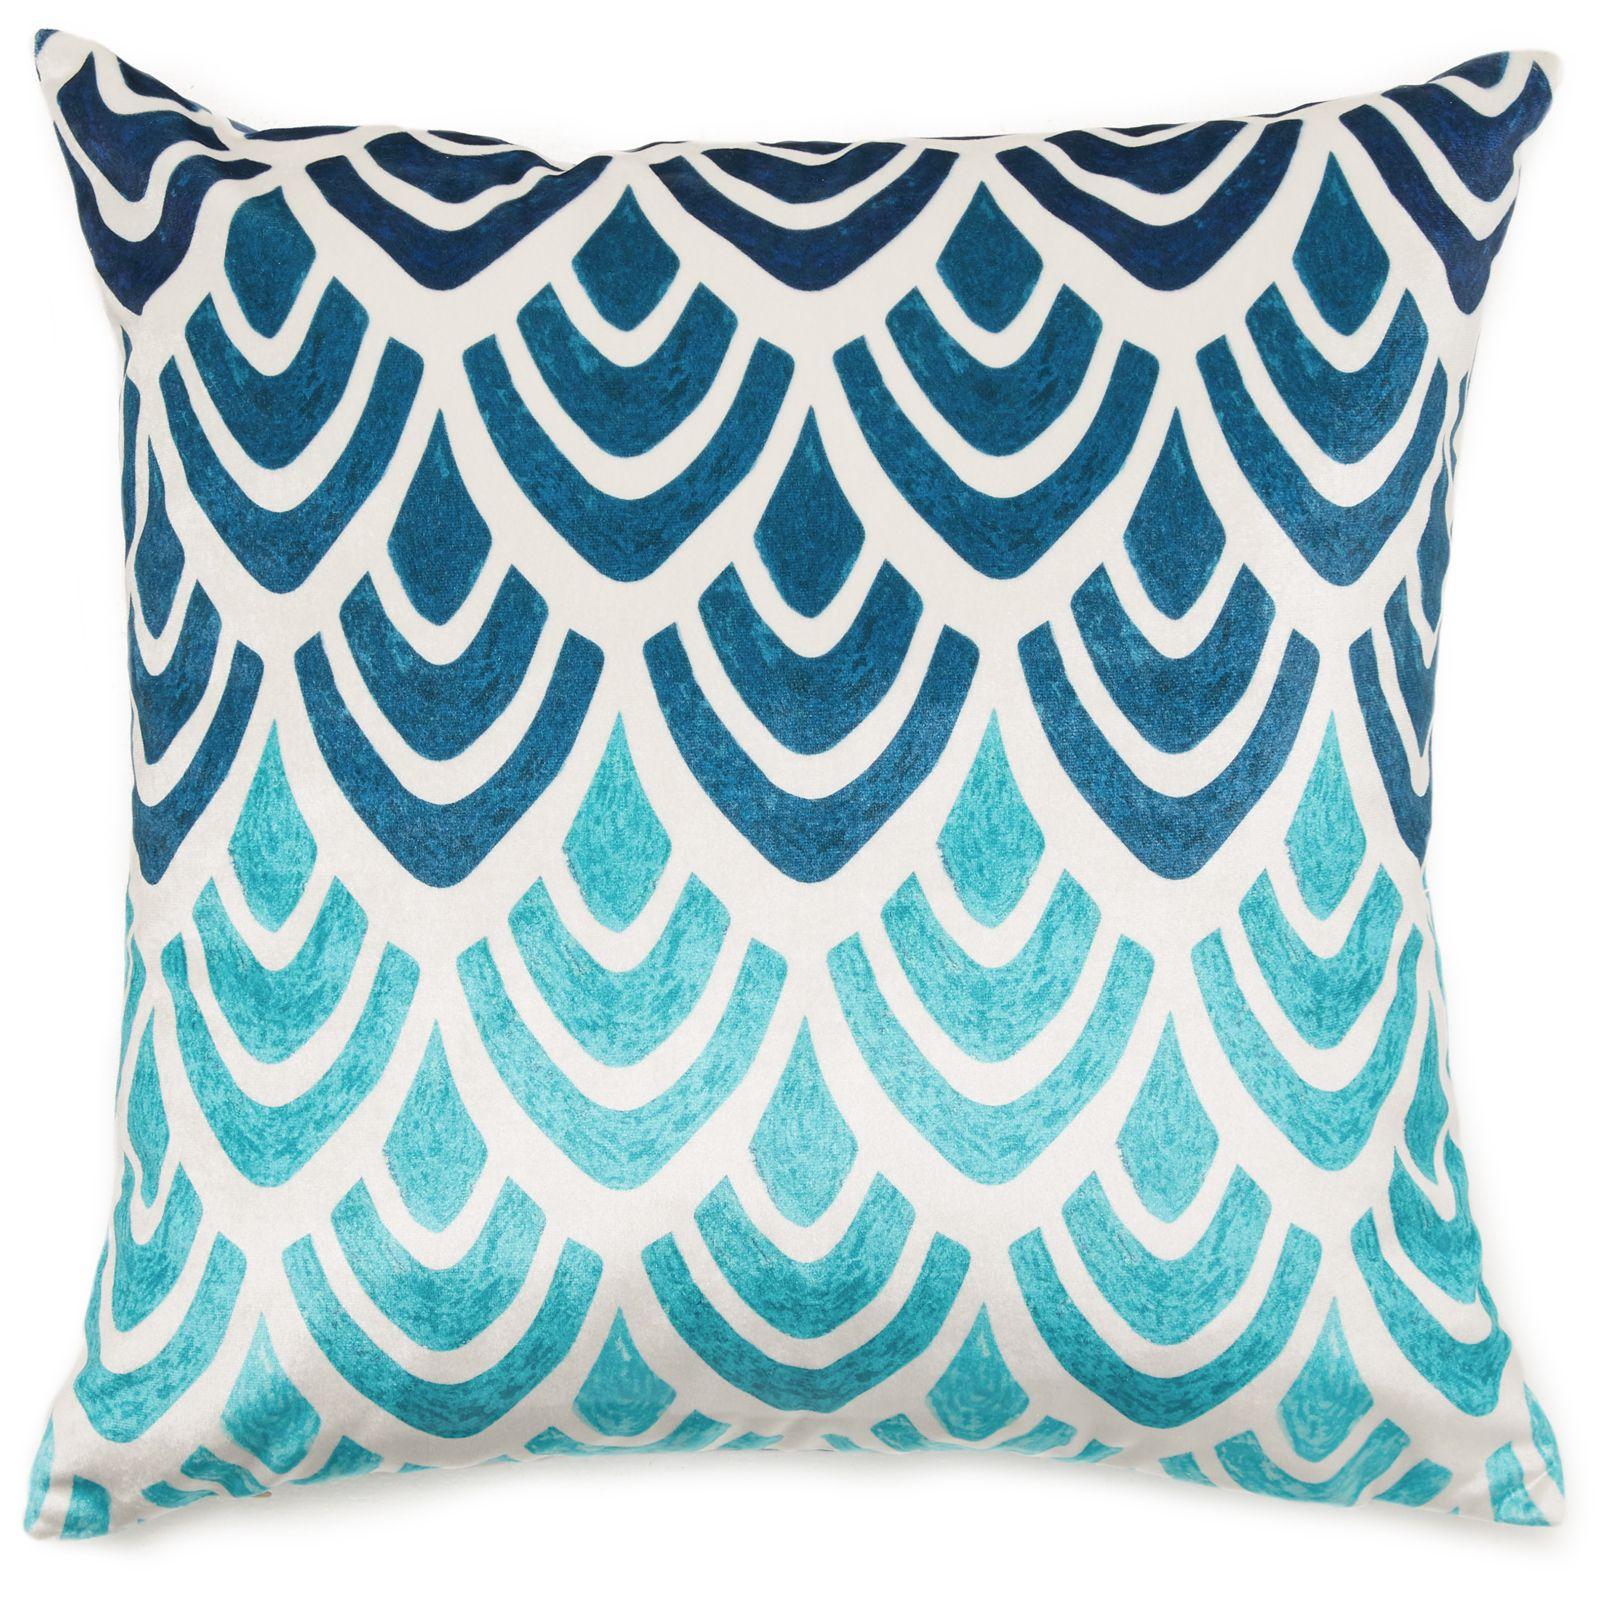 20 cheap throw pillows for under 25